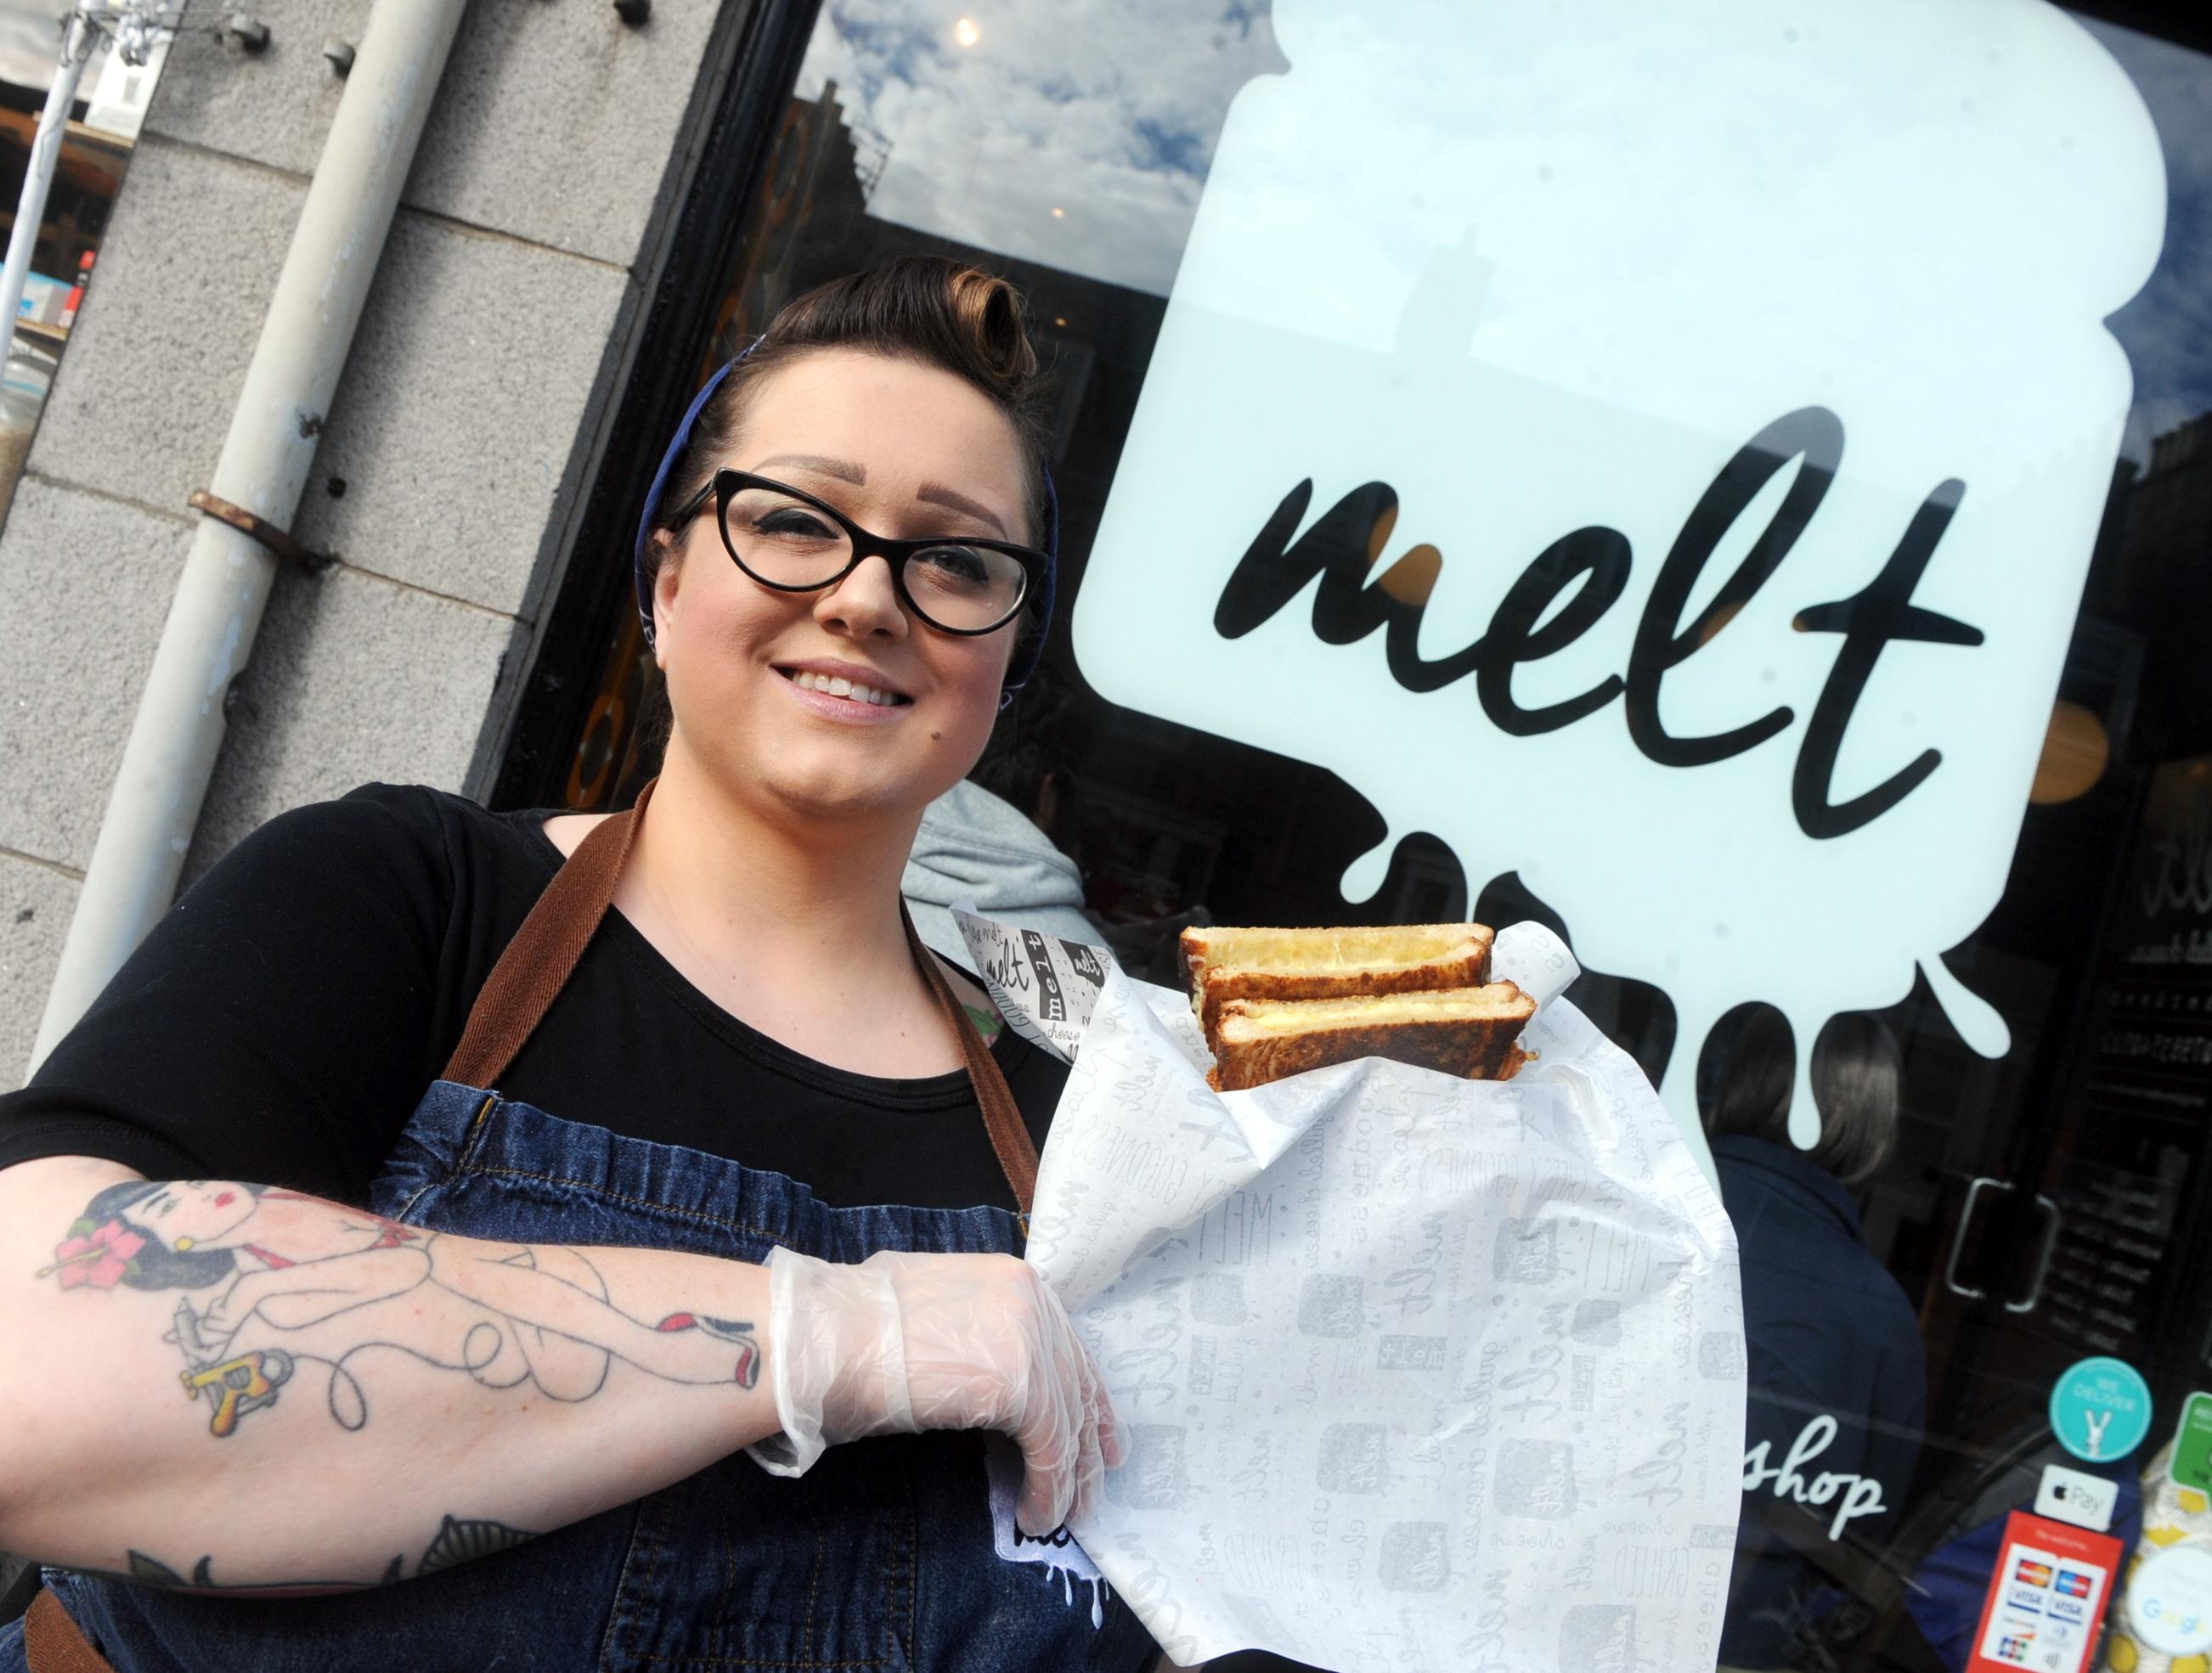 Aberdeen-based Melt received a loan in 2016